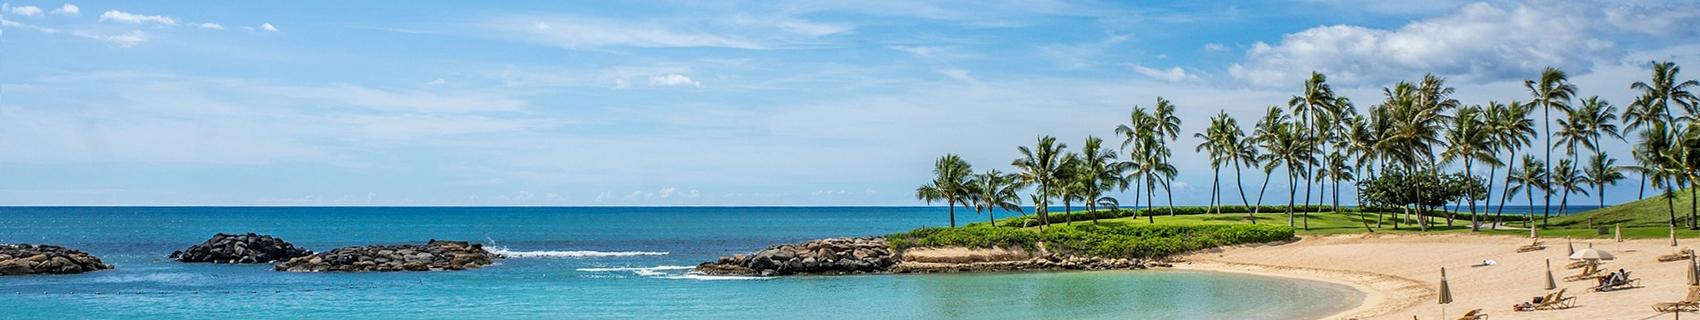 KAFH hawaii scenery